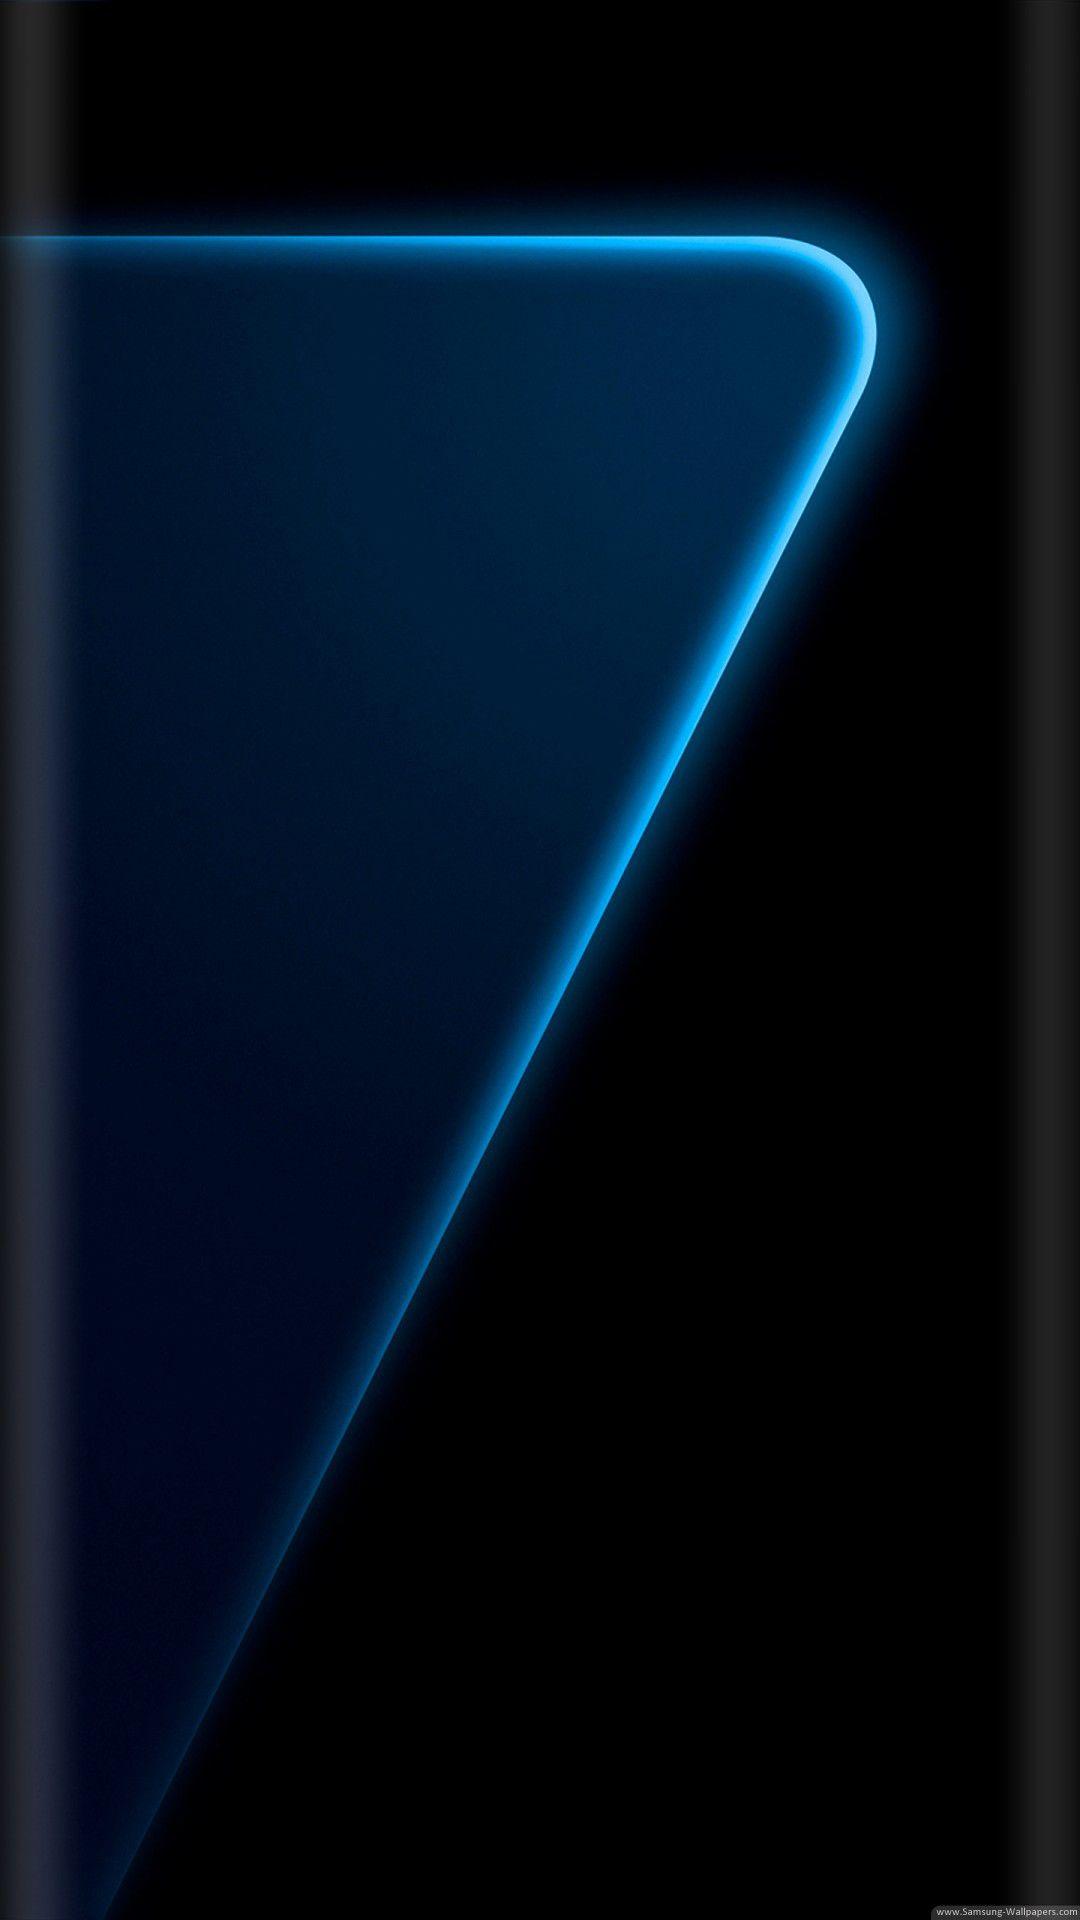 1080x1920 Samsung Logo Wallpapers Wallpaper Cave Samsung Wallpaper Phone Wallpaper Design Samsung Galaxy Wallpaper